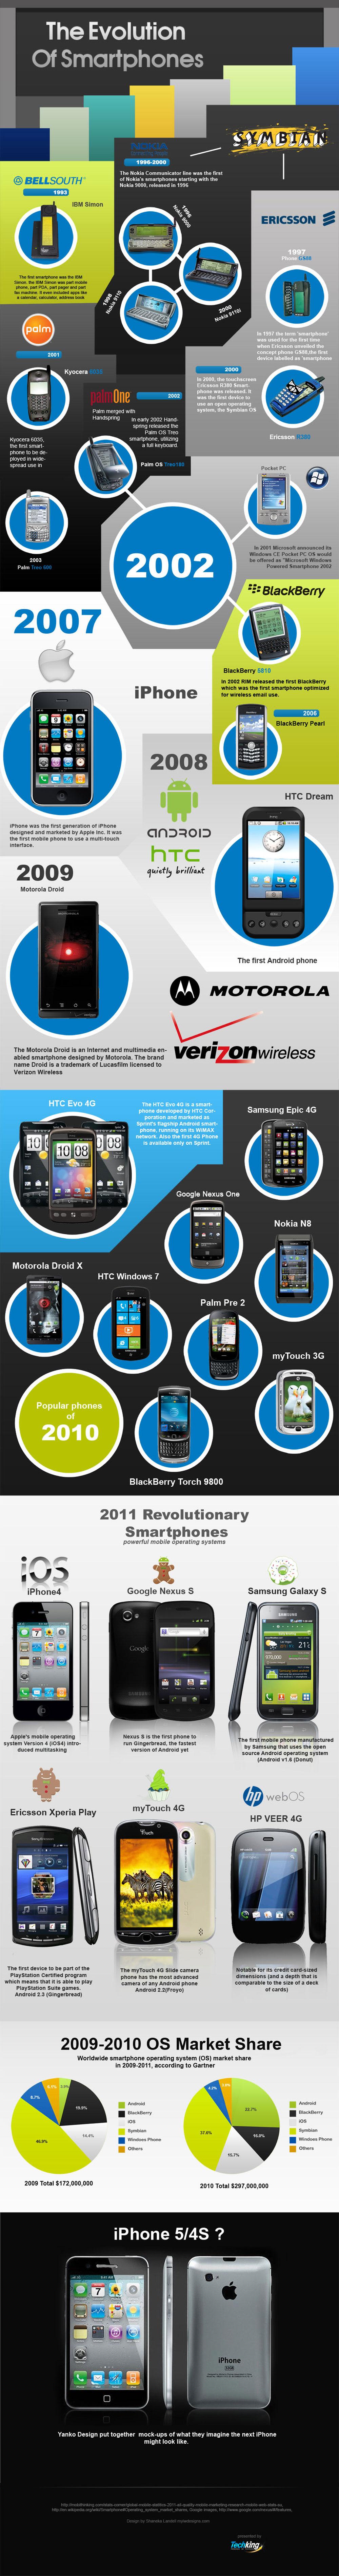 infographie-histoire-smartphone-testking